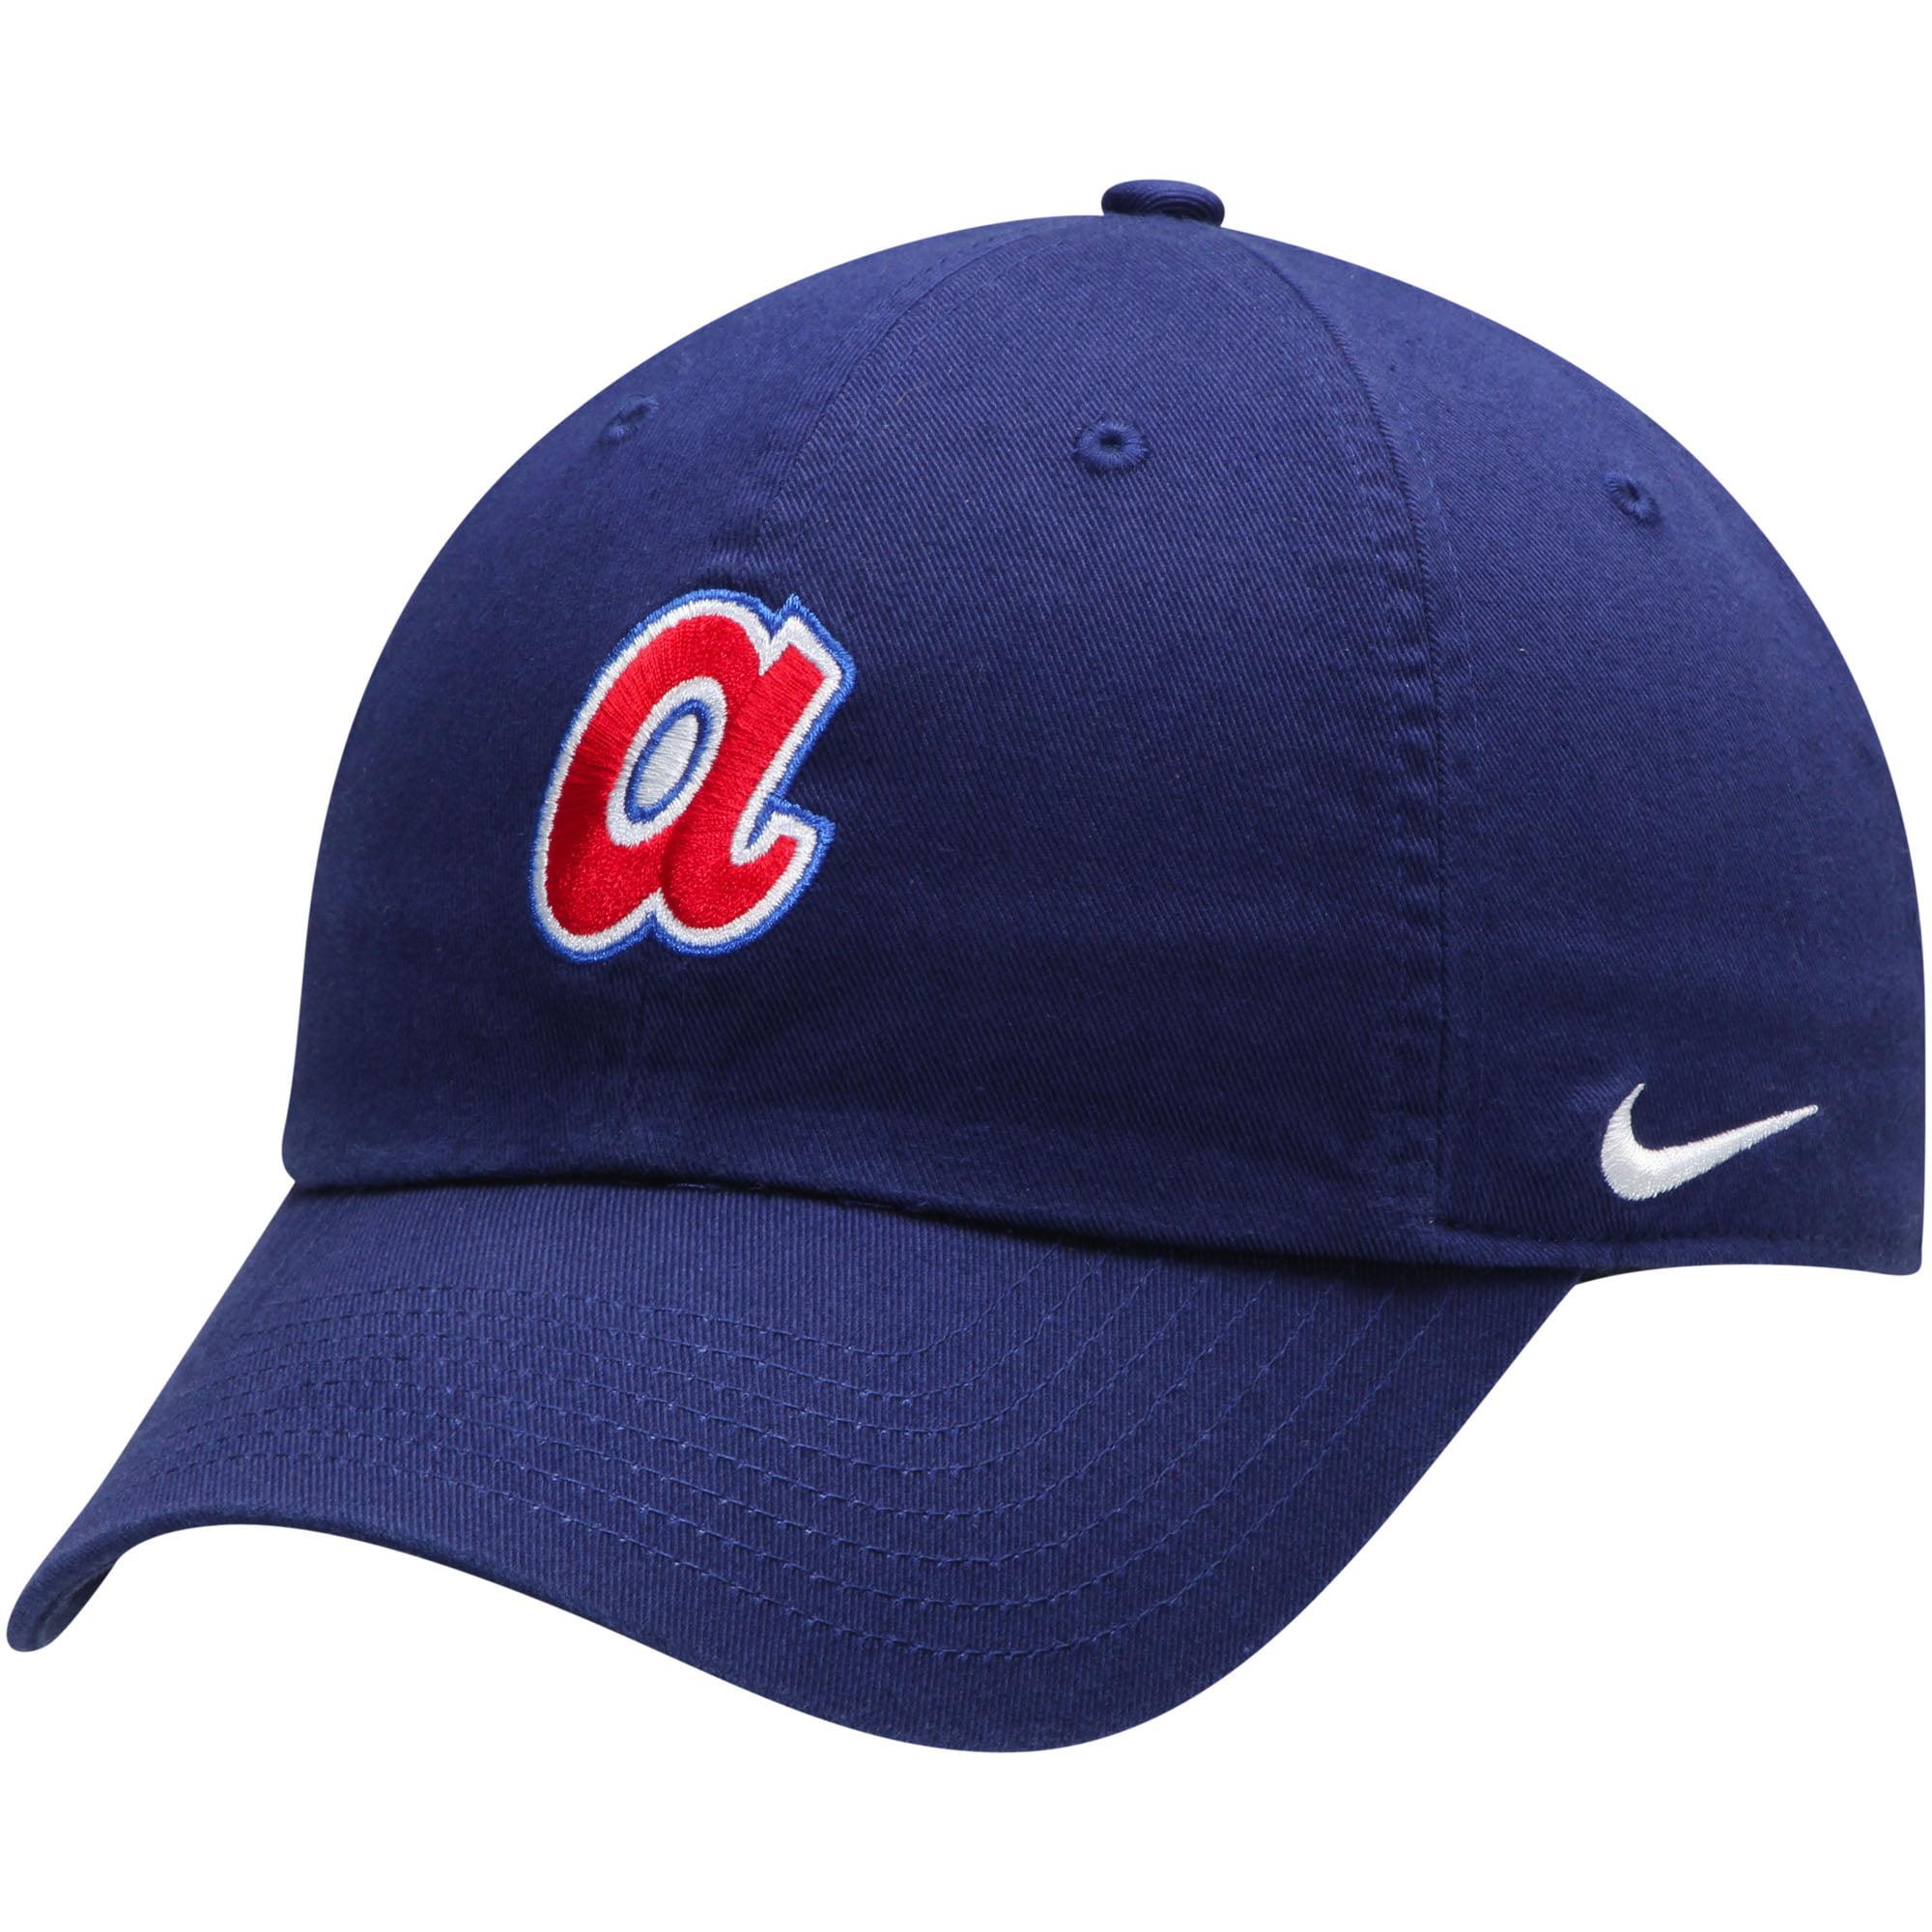 Atlanta Braves Nike MLB Heritage 86 Adjustable Hat - Royal - OSFA -  Walmart.com a6618e80750